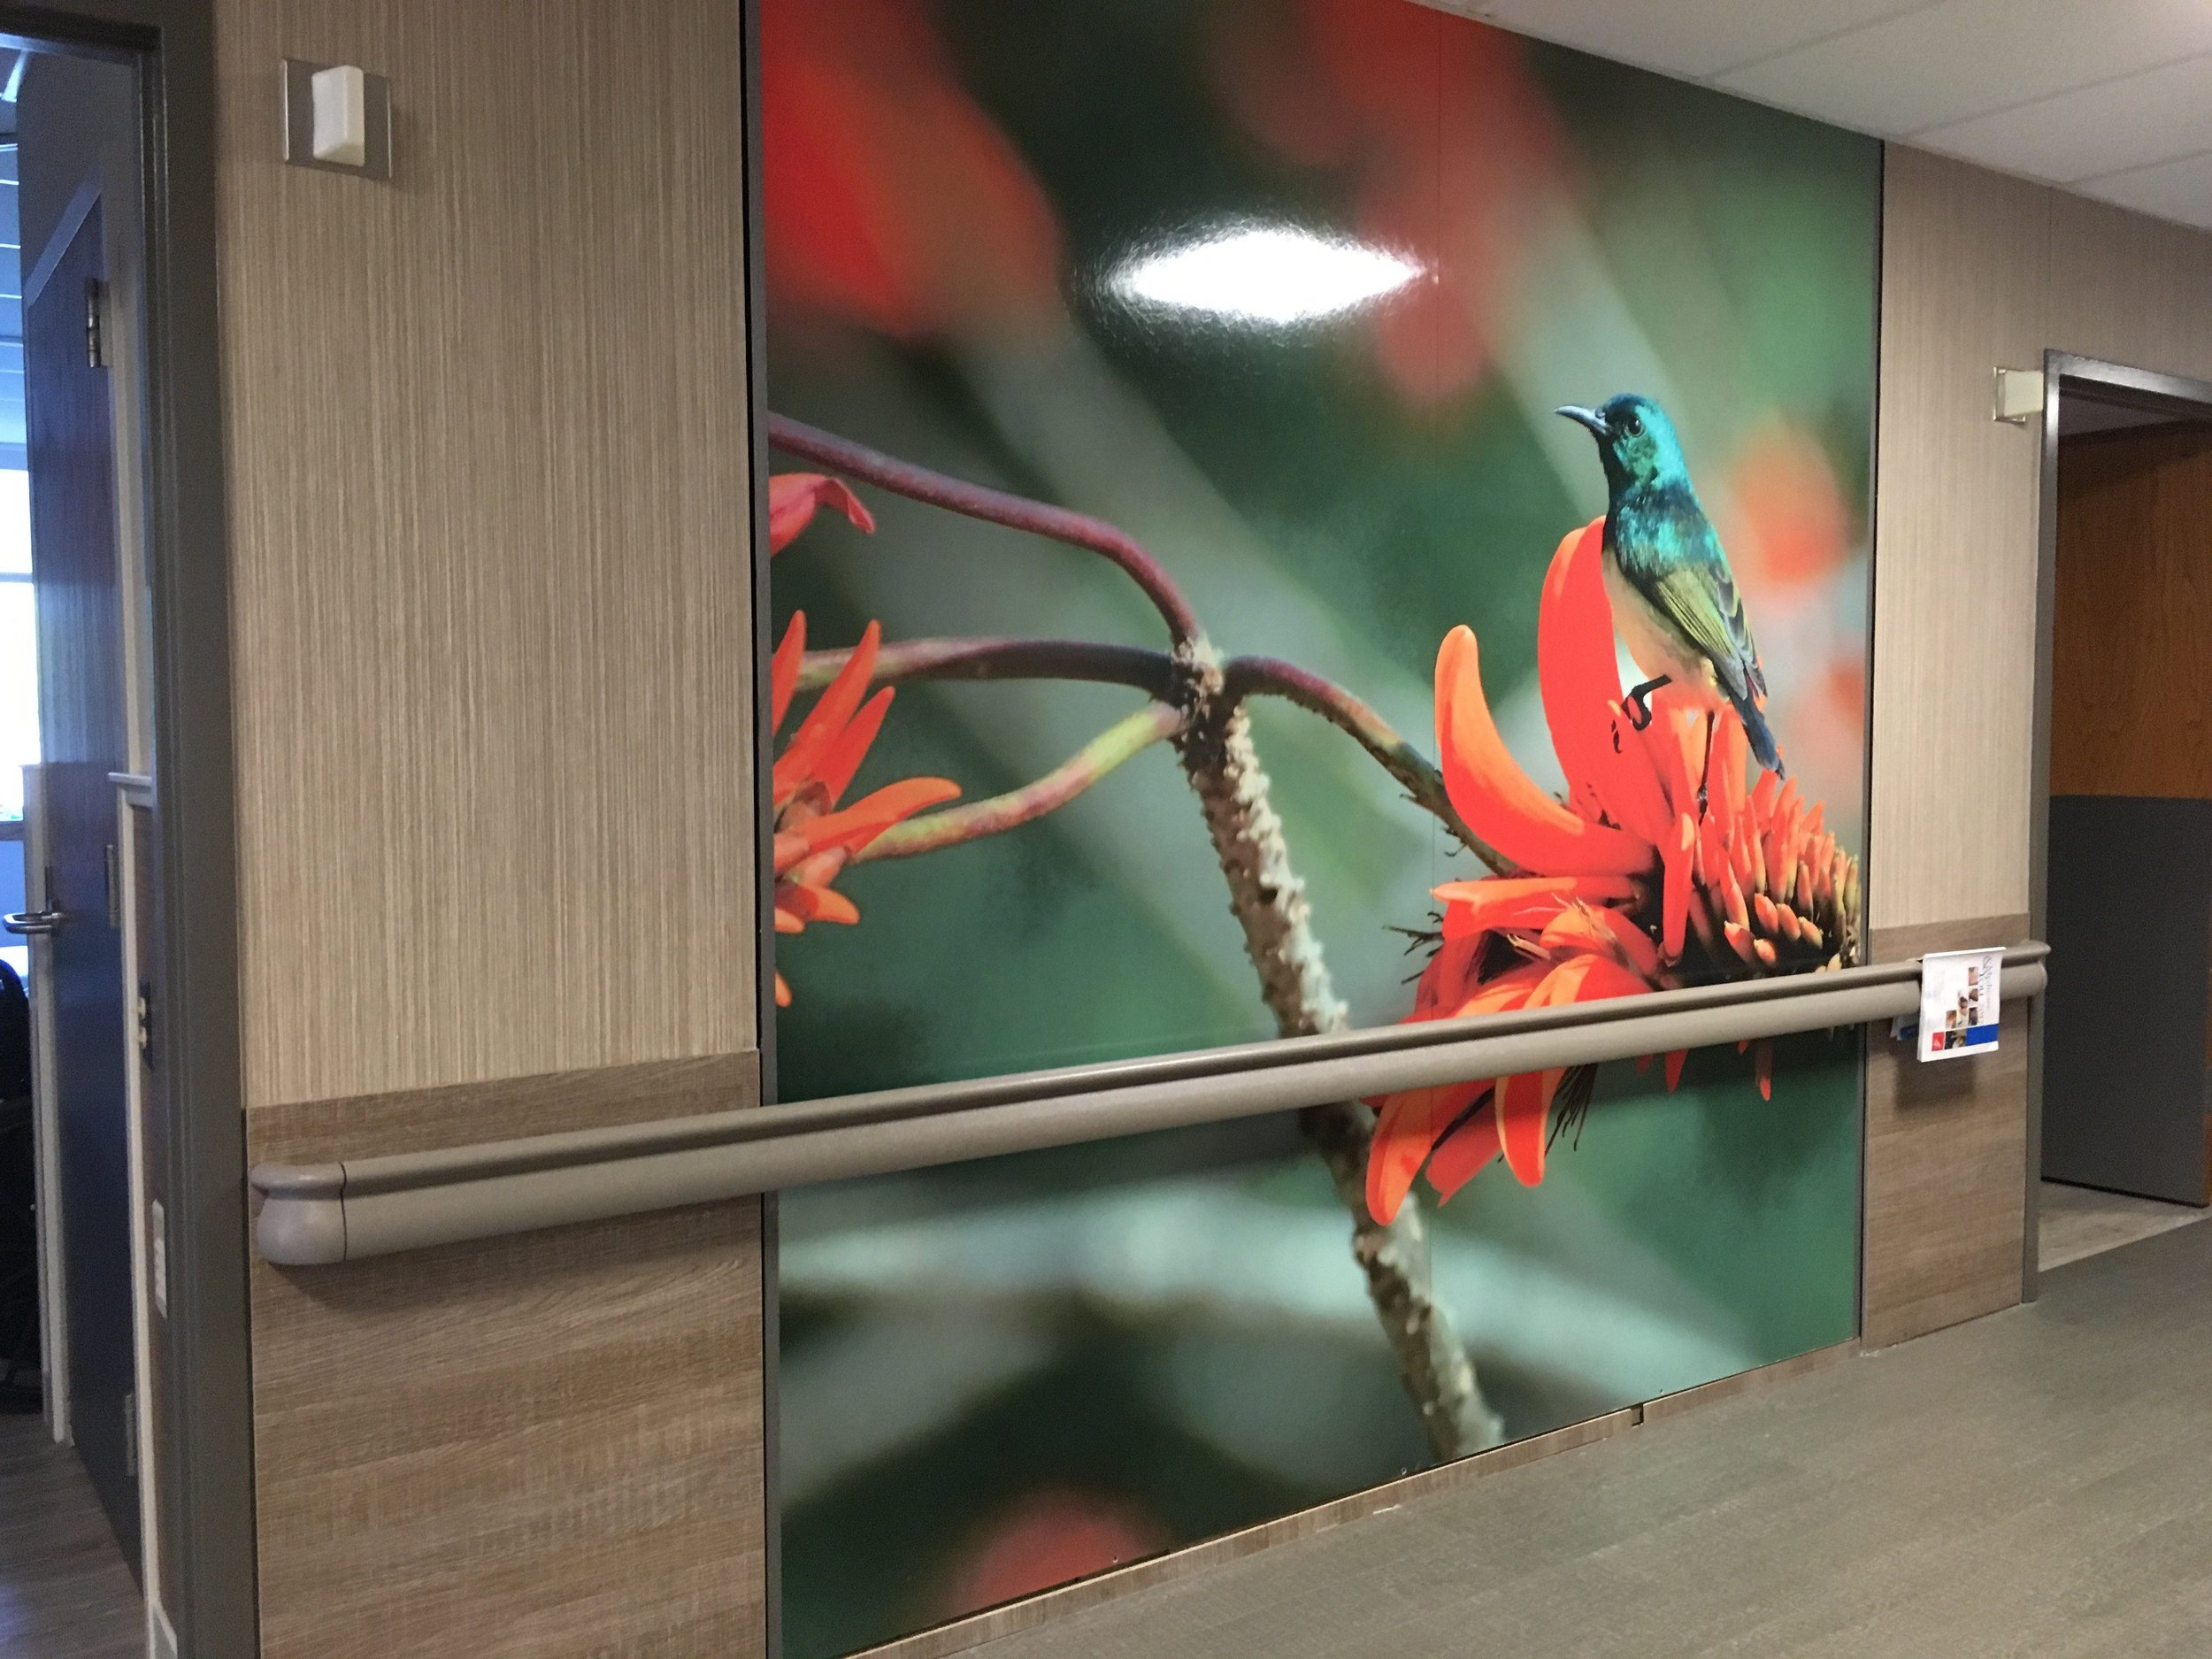 Aparna-Bonda_Fusion-Hospital-3-e1511898672659.jpg